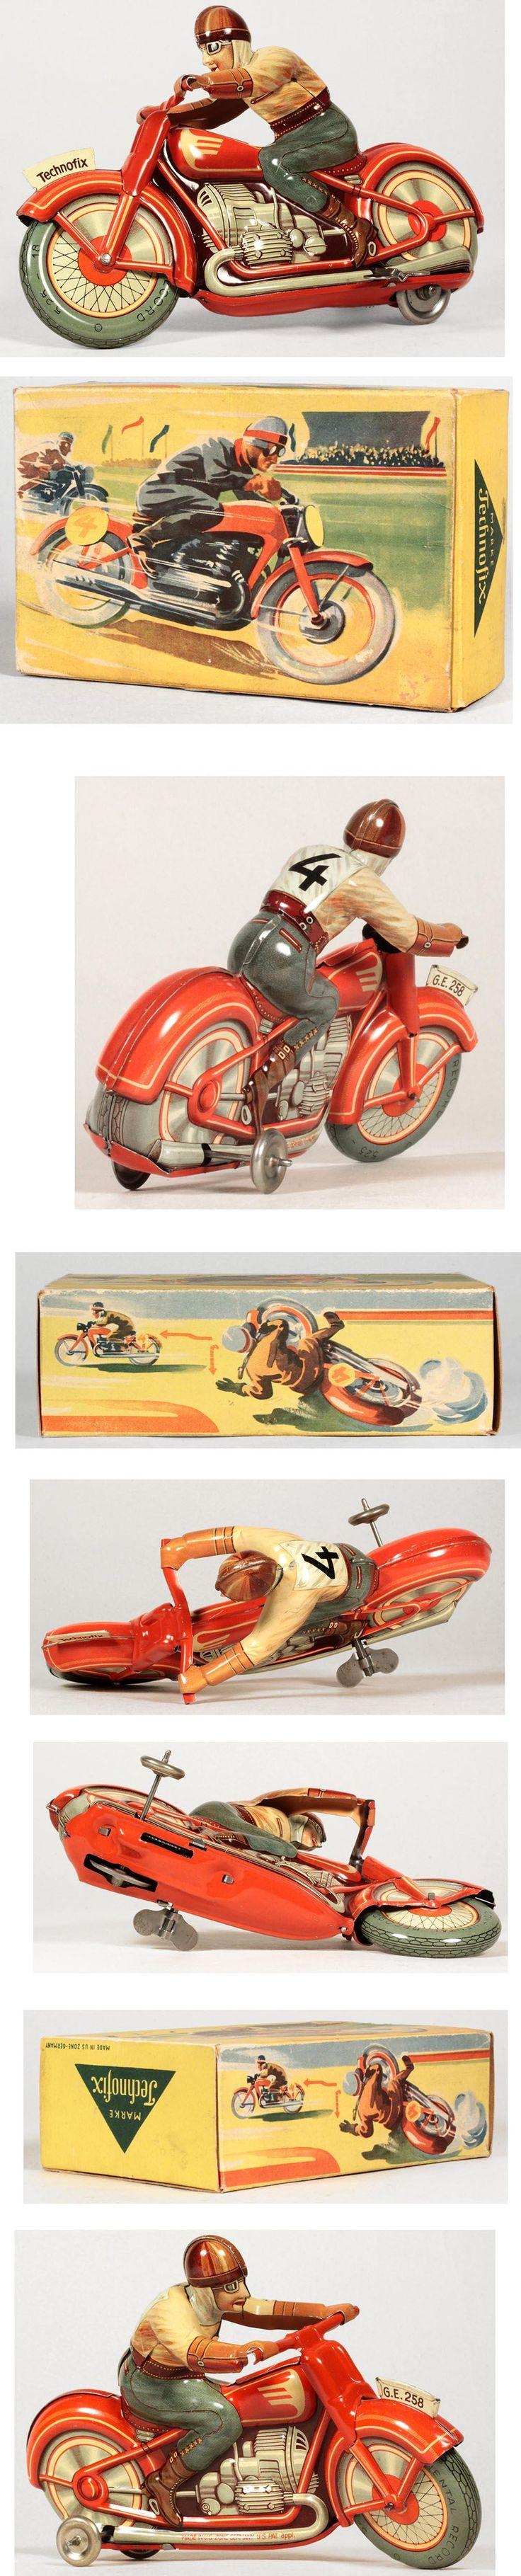 trick motorcycle...Technofix, Germany